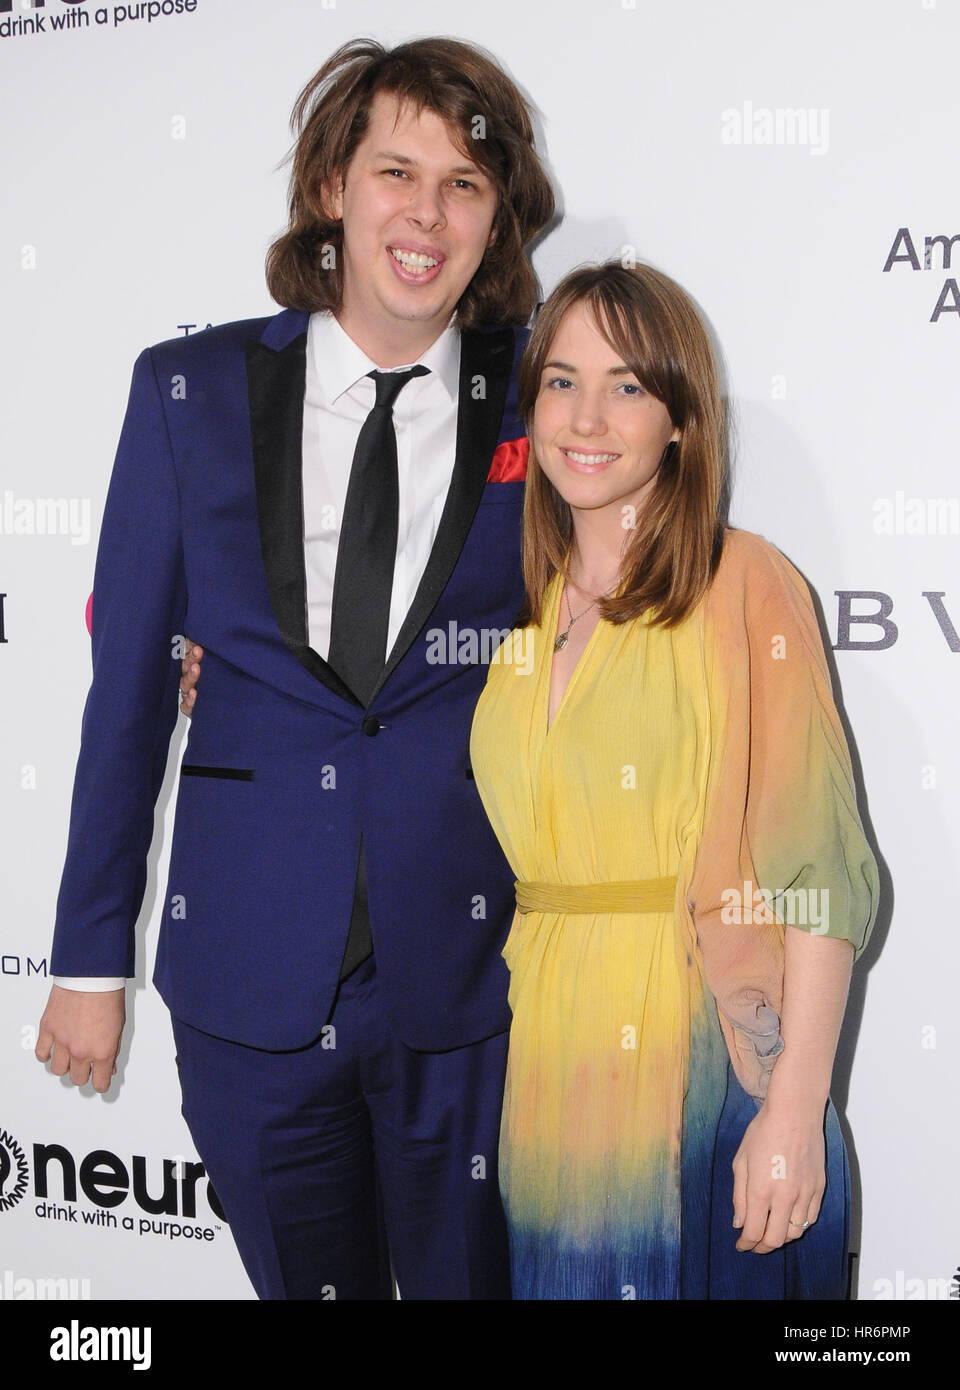 Matty Cardarople height